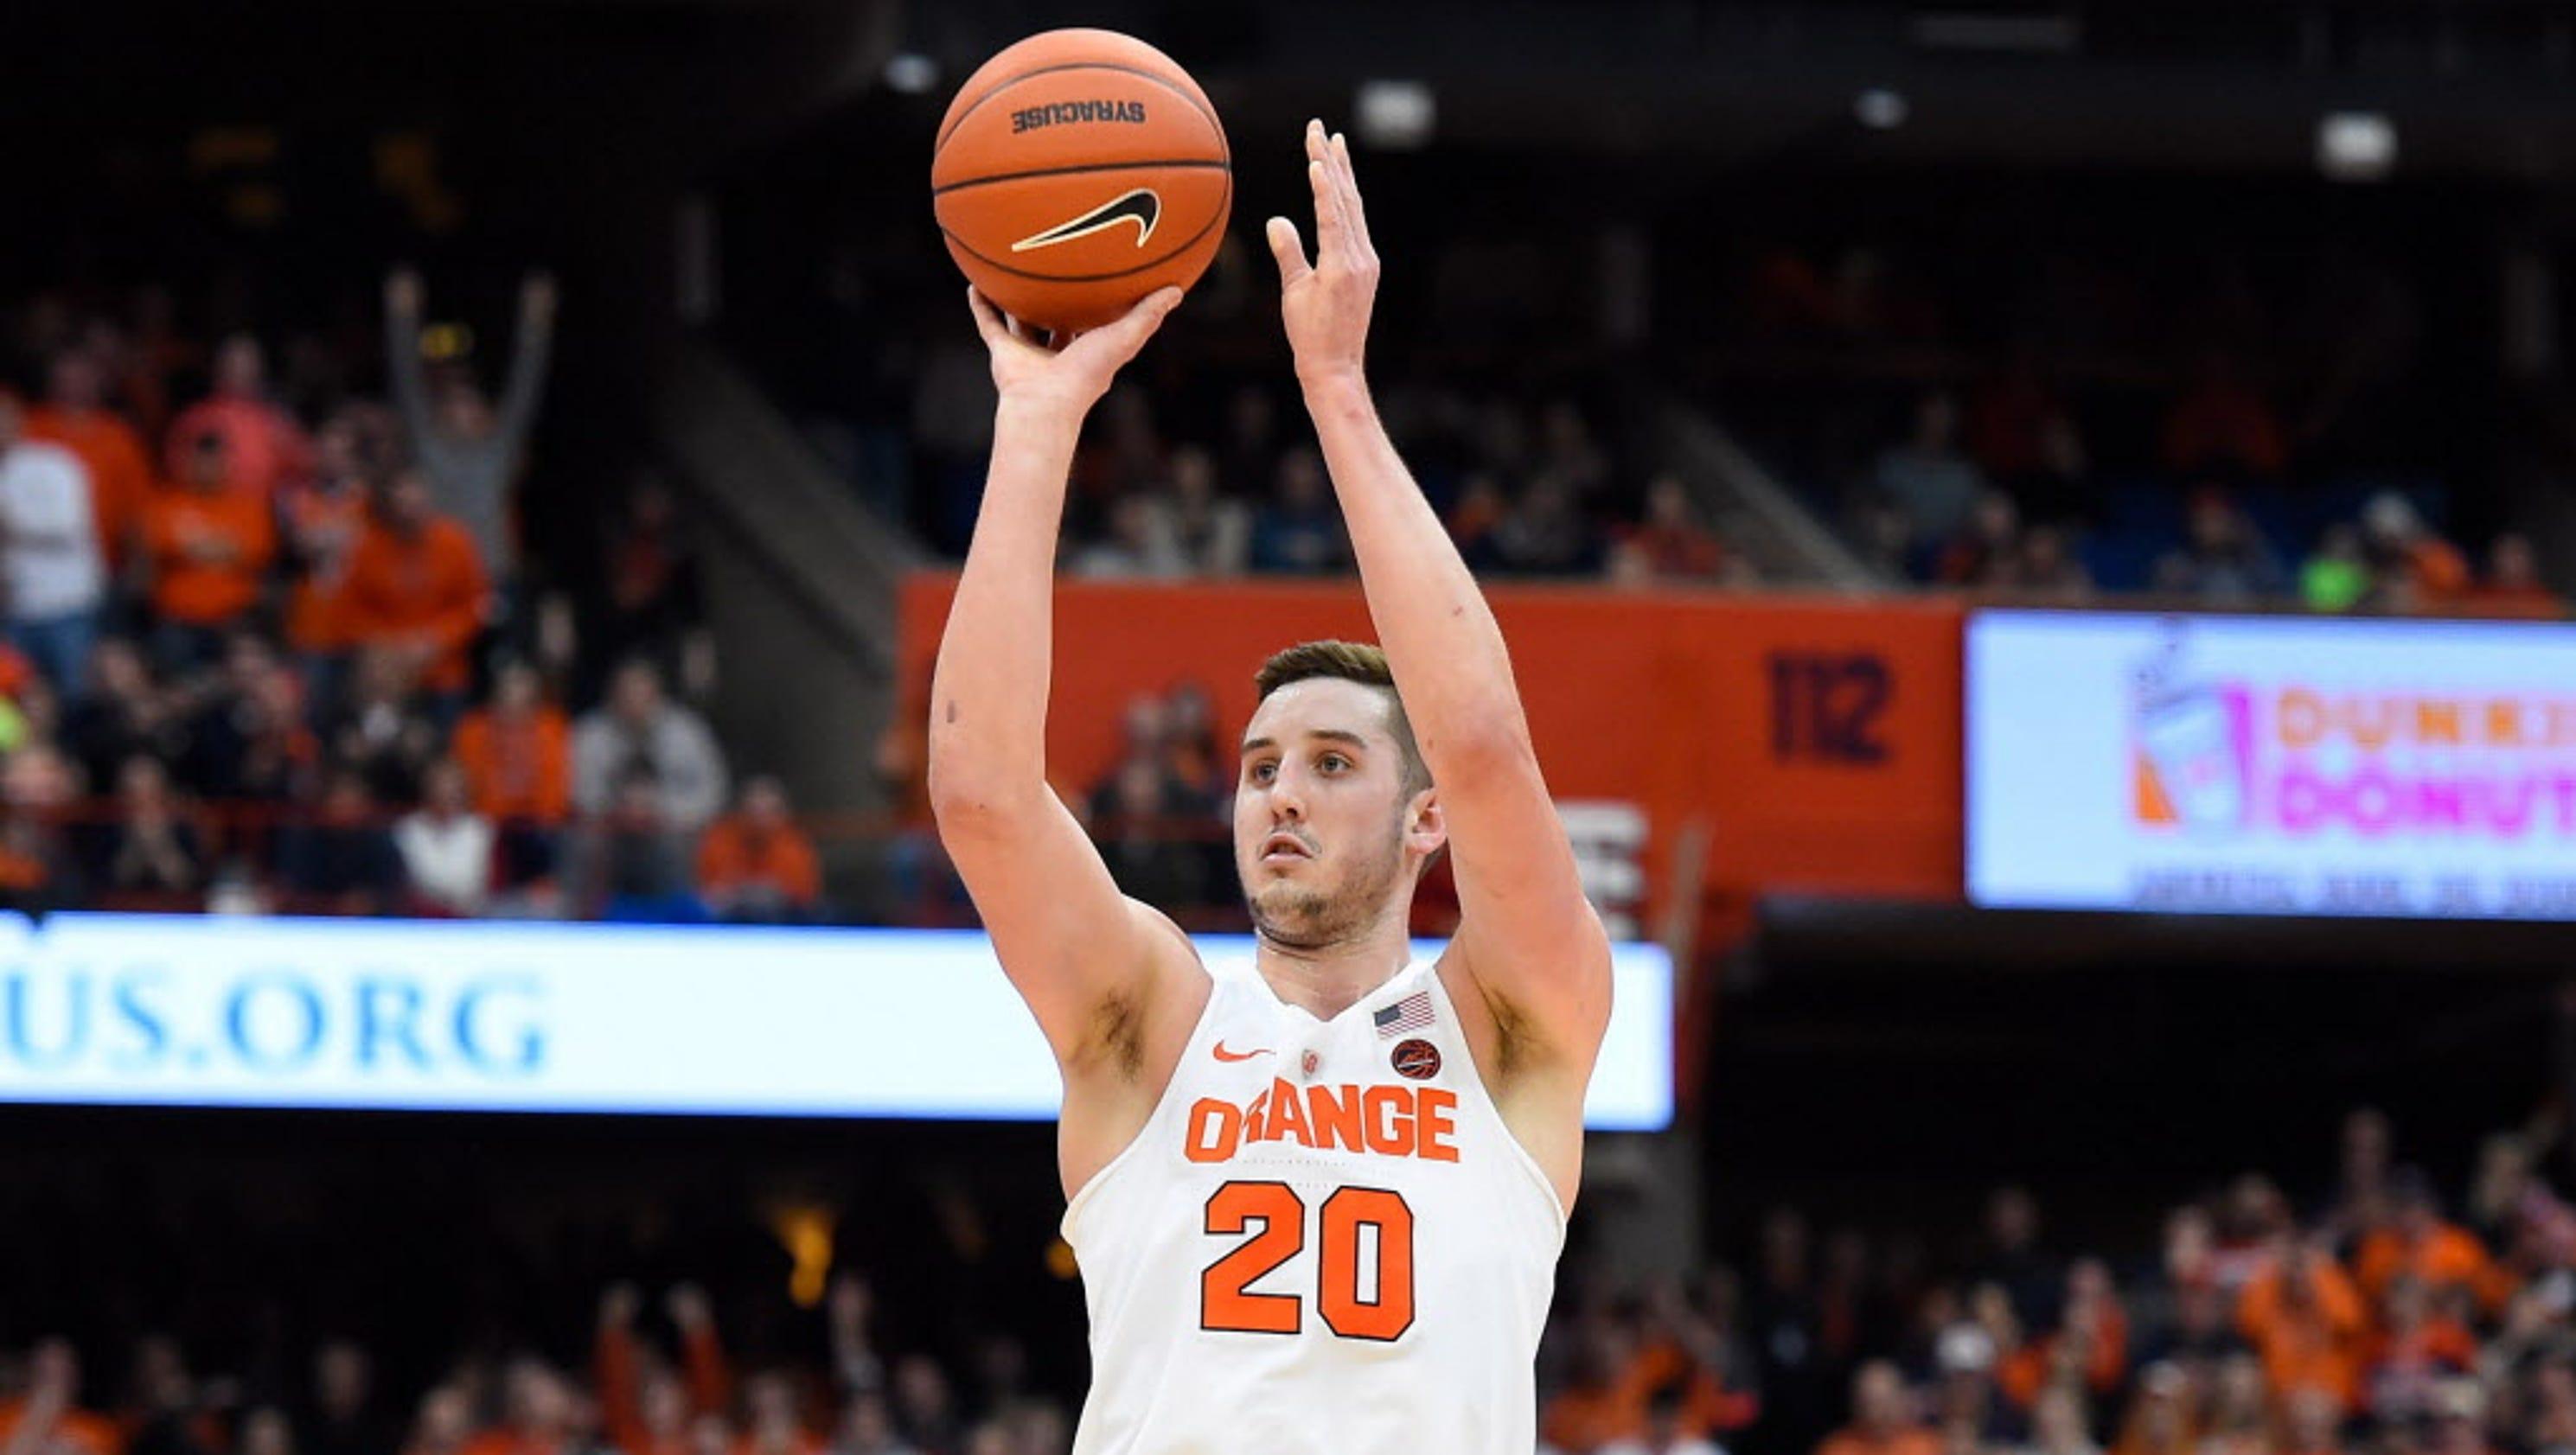 College basketball underclassmen declaring for 2017 NBA draft